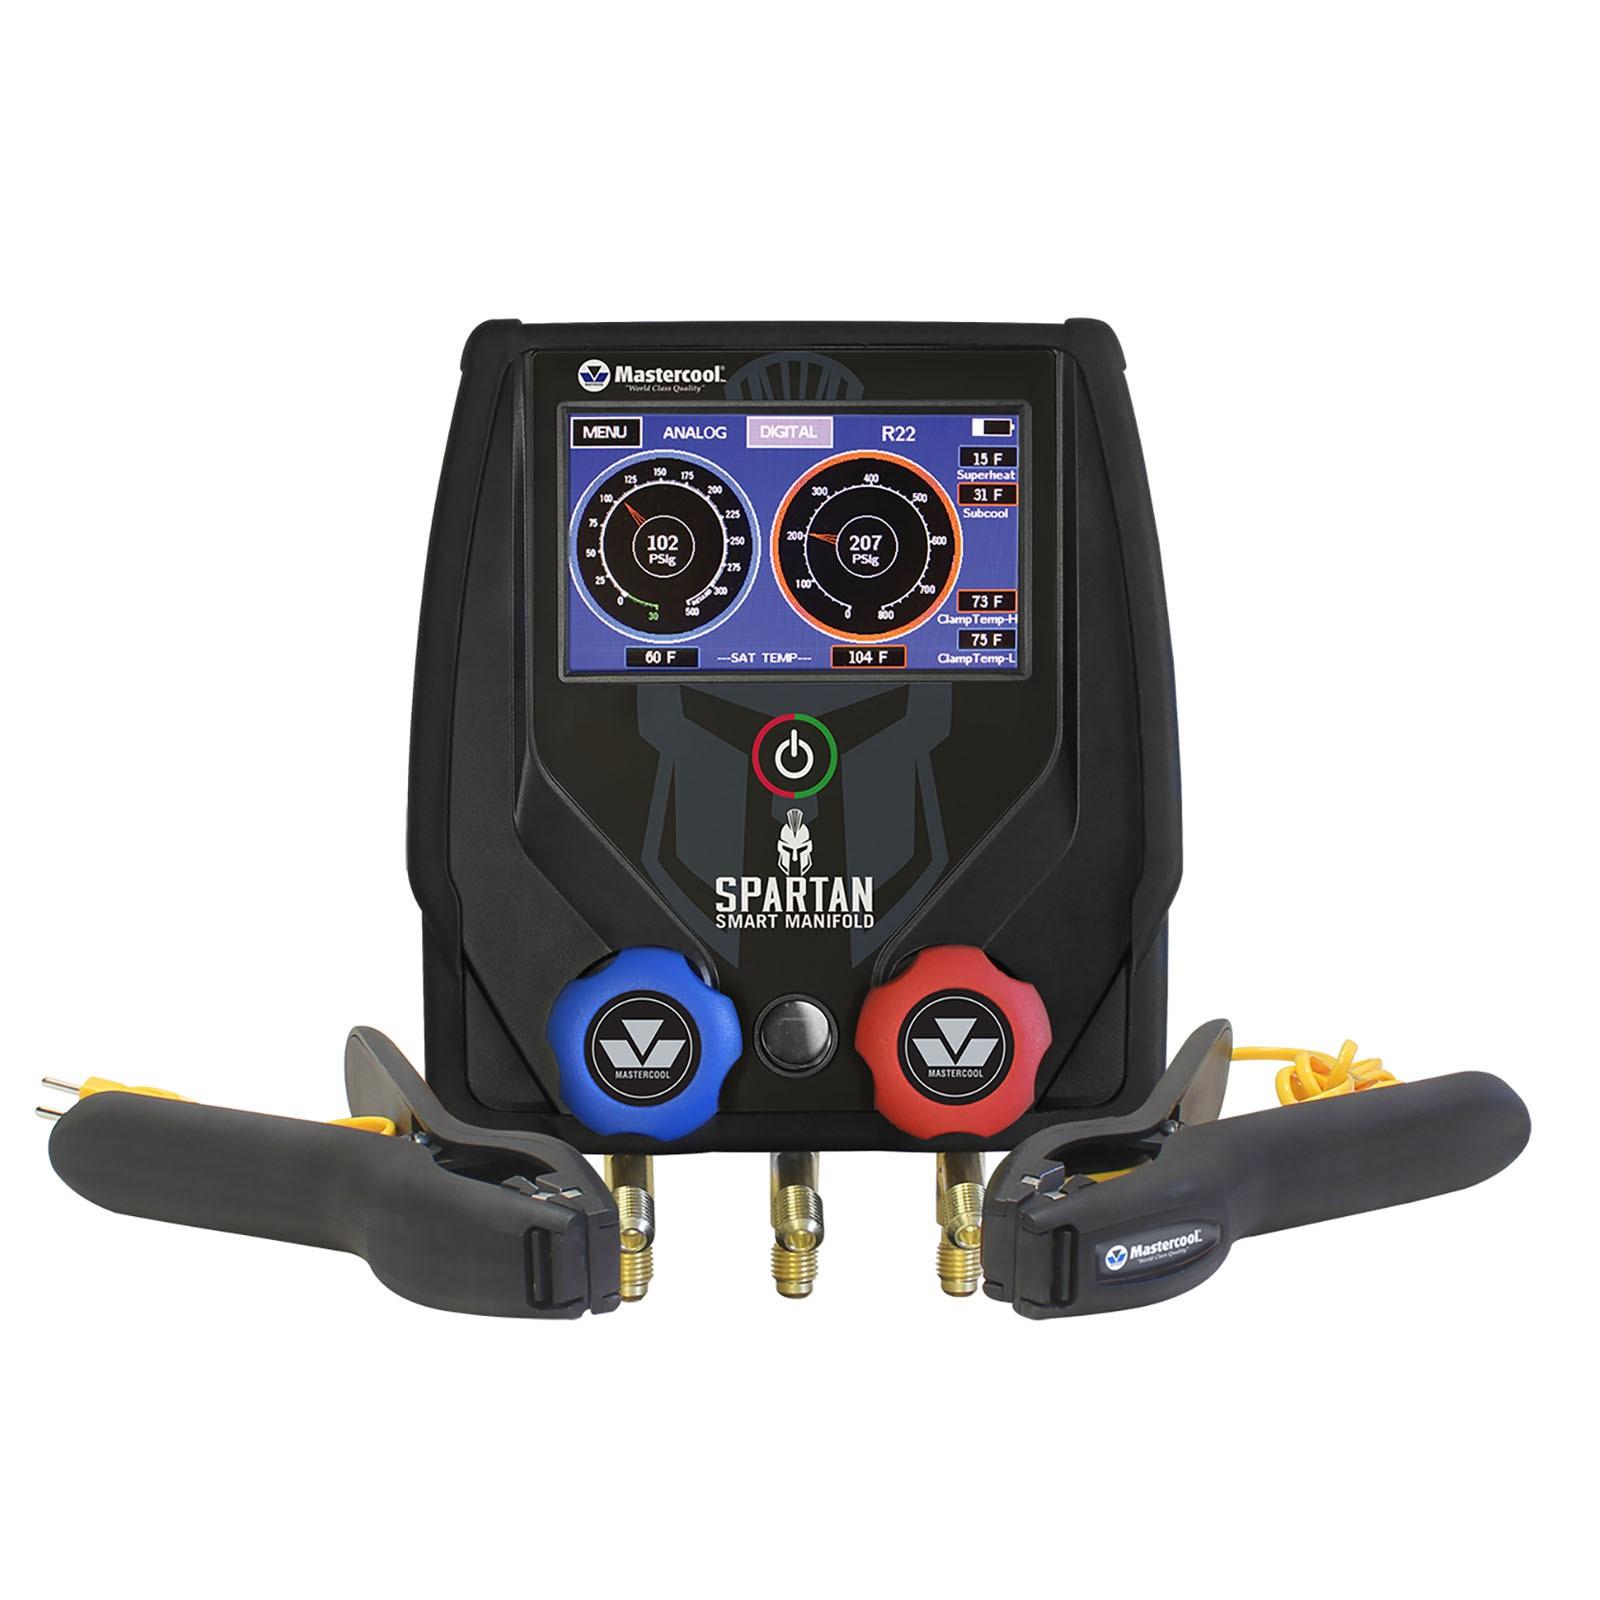 Manifold Digital Spartan 2 vias Bluetooth com Vacuômetro/2 termopares/ Mala Transporte